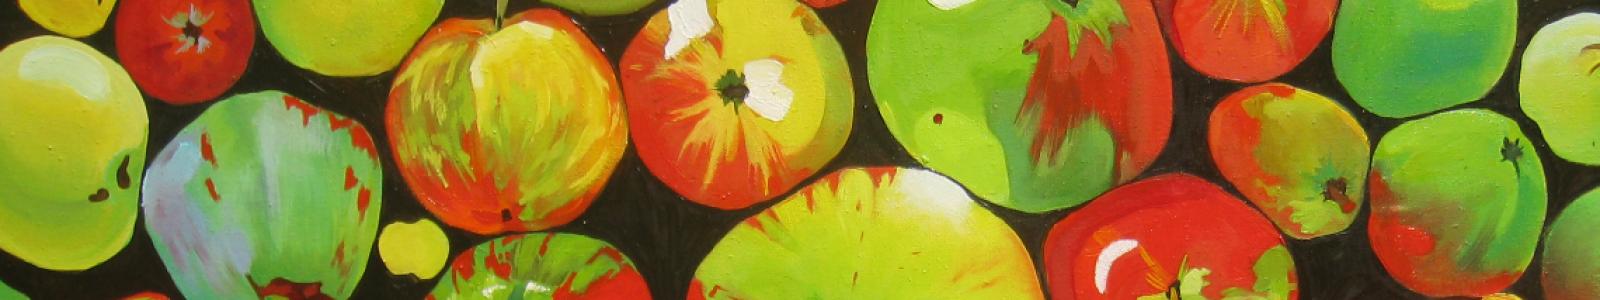 Gallery Painter Alesia Dolzhenko